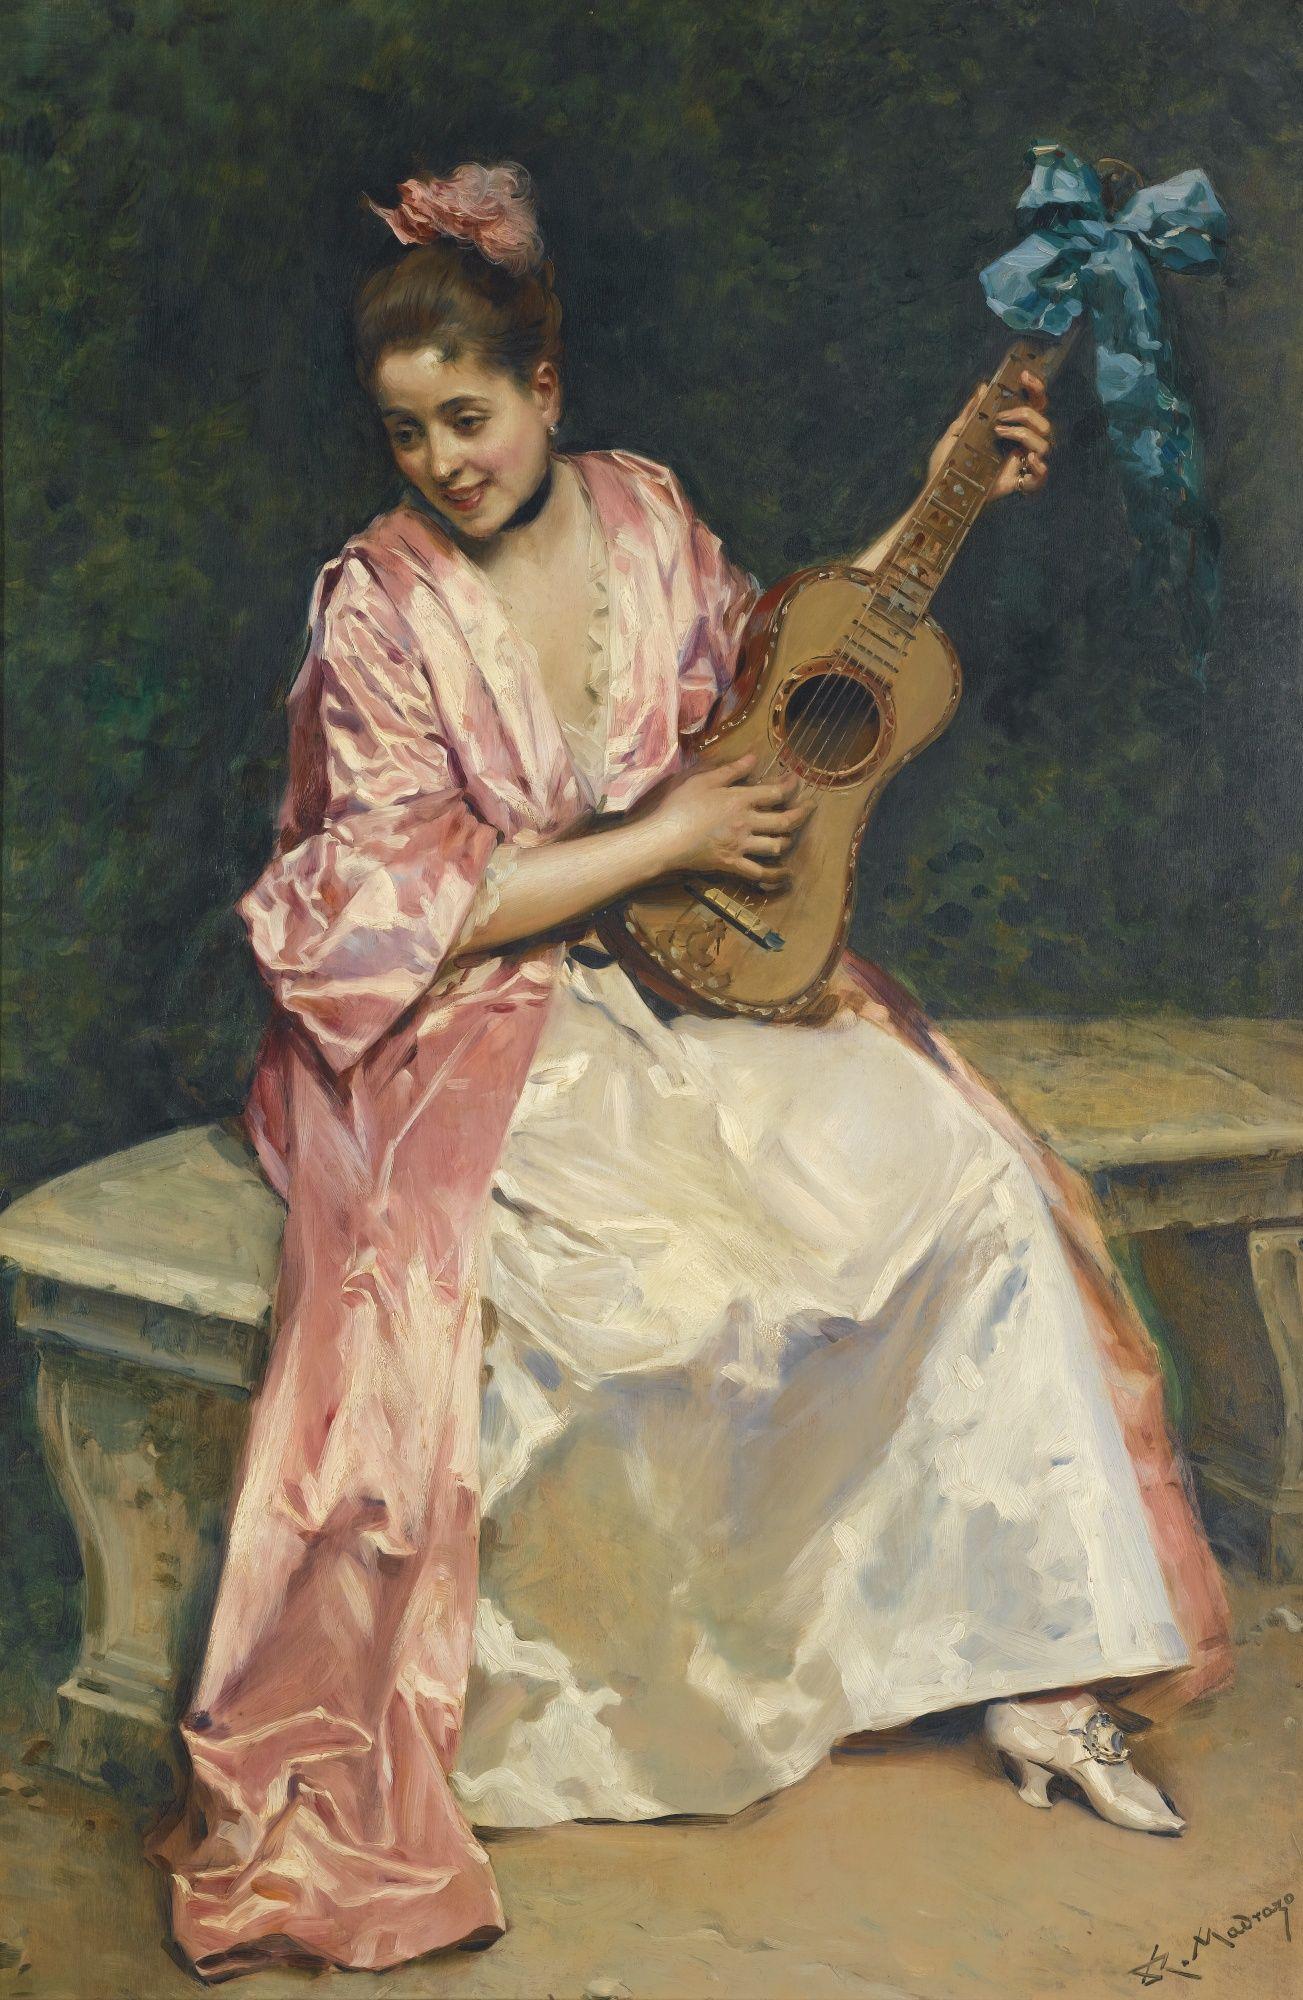 RAIMUNDO DE MADRAZO SPANISH 18411920 ALINE WITH GUITAR